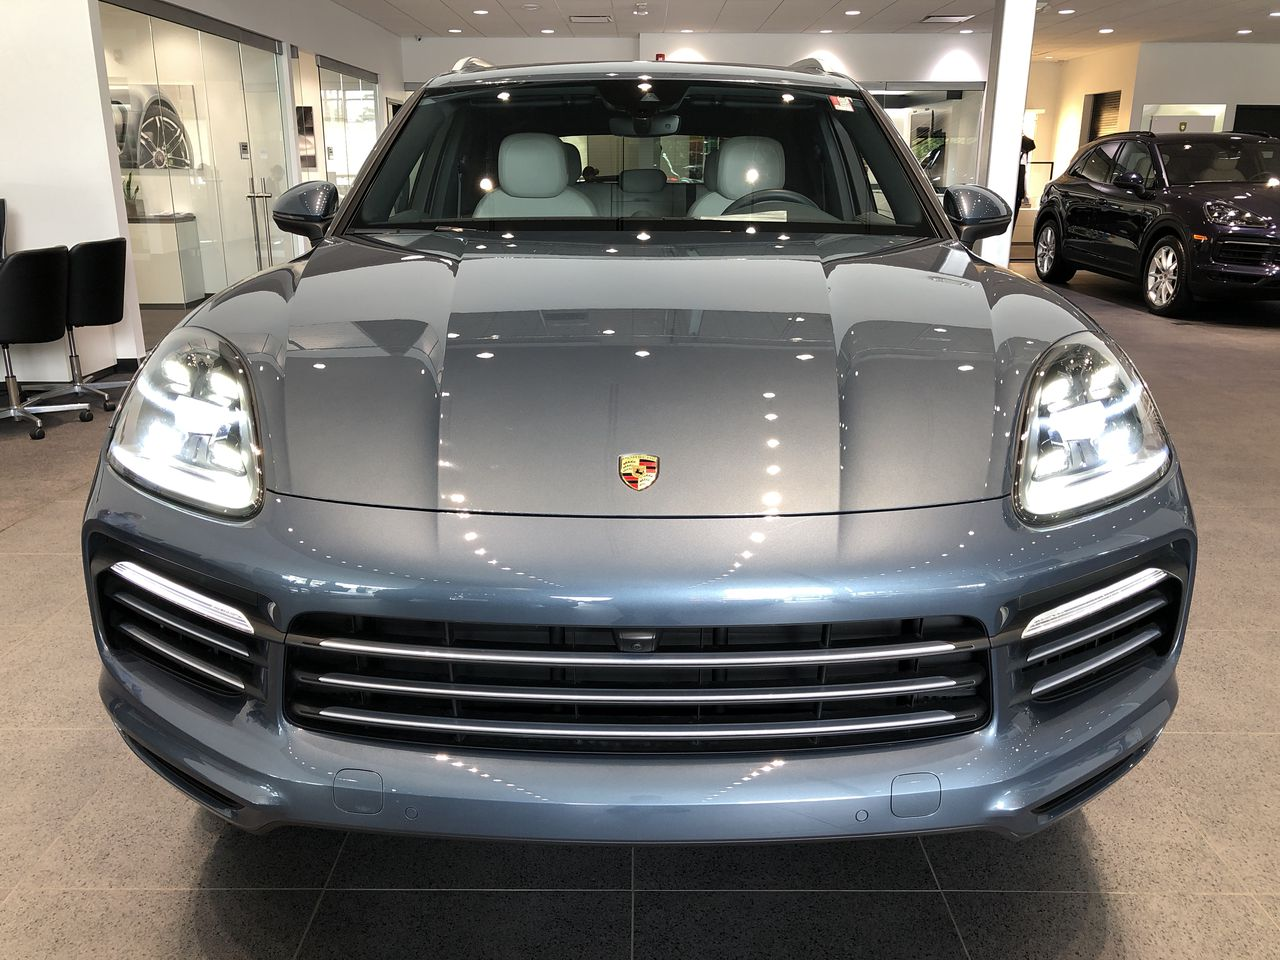 New 2019 Porsche Cayenne E-Hybrid- MSRP $106,330